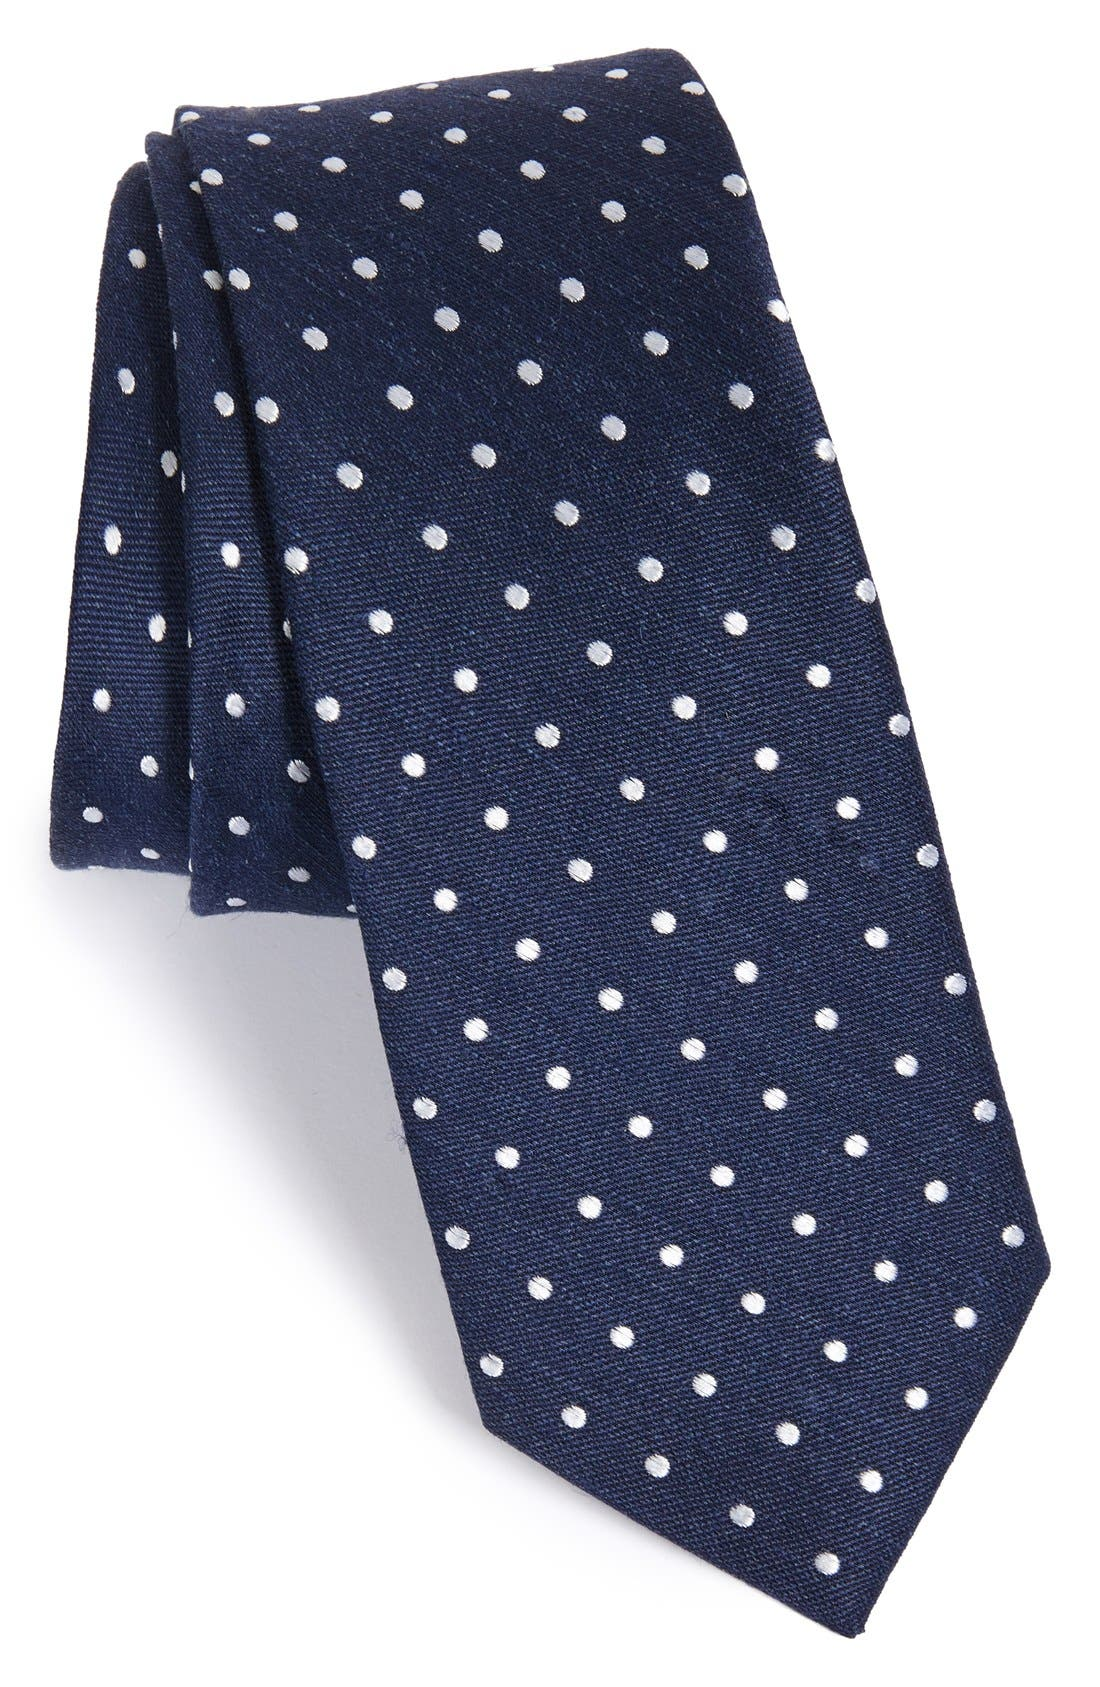 Main Image - The Tie Bar Dot Silk & Linen Tie